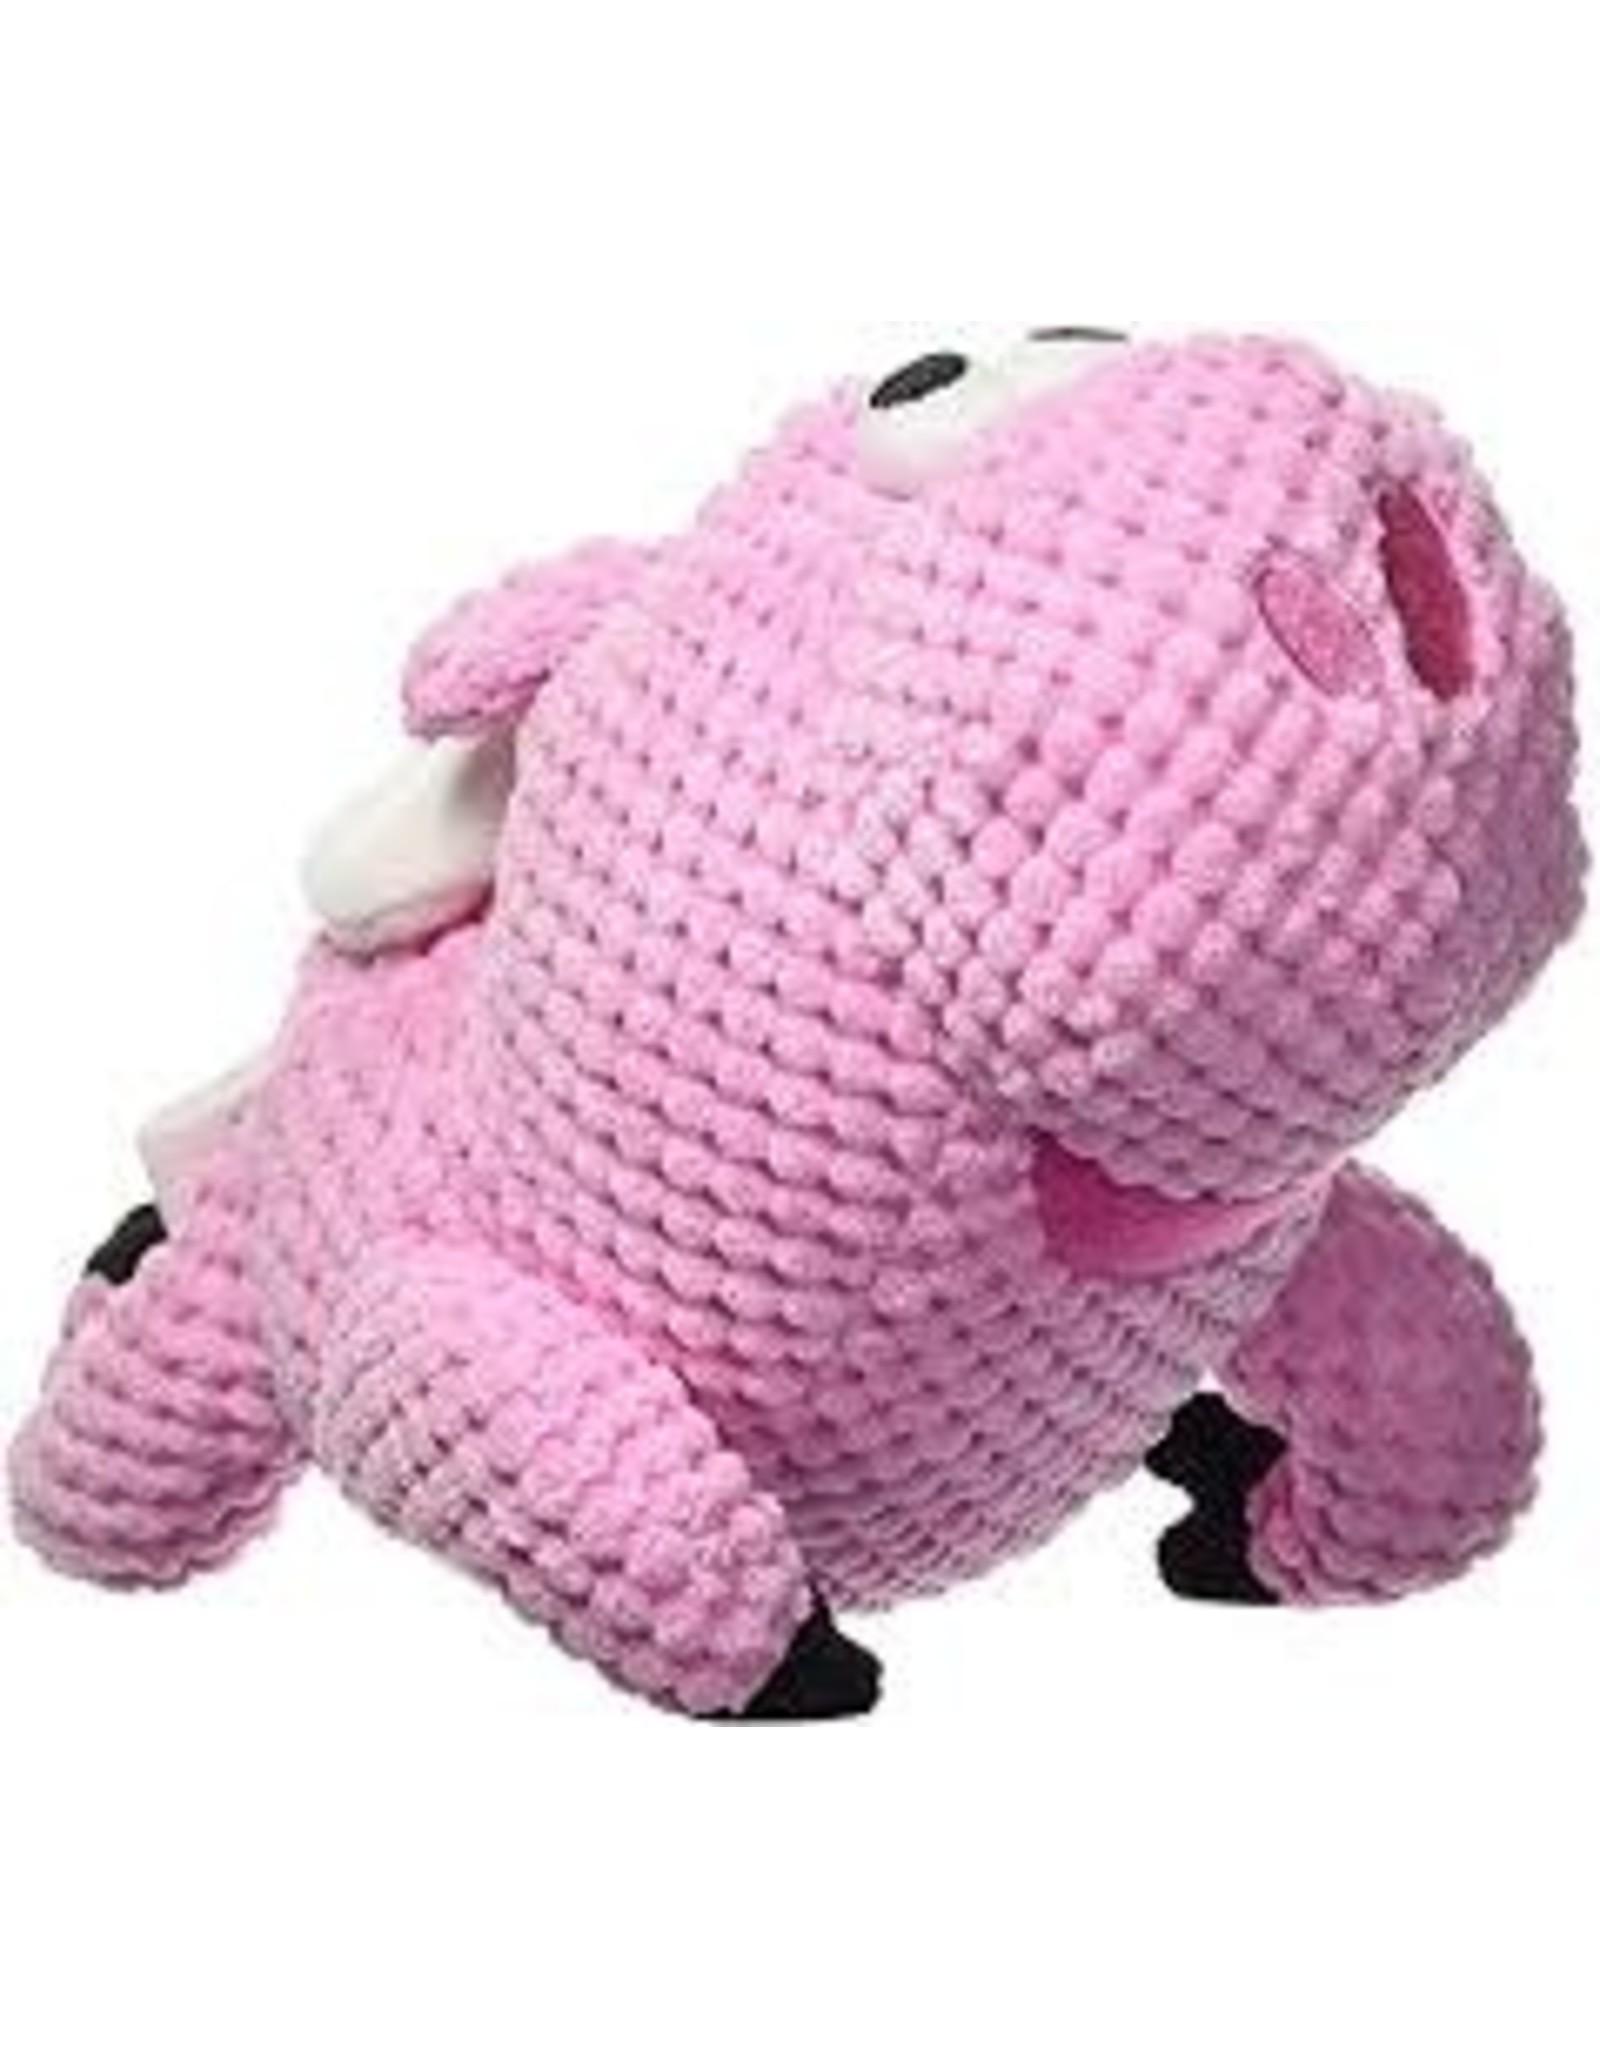 Go Dog Go Dog Plush Flying Pig: Pink, Mini